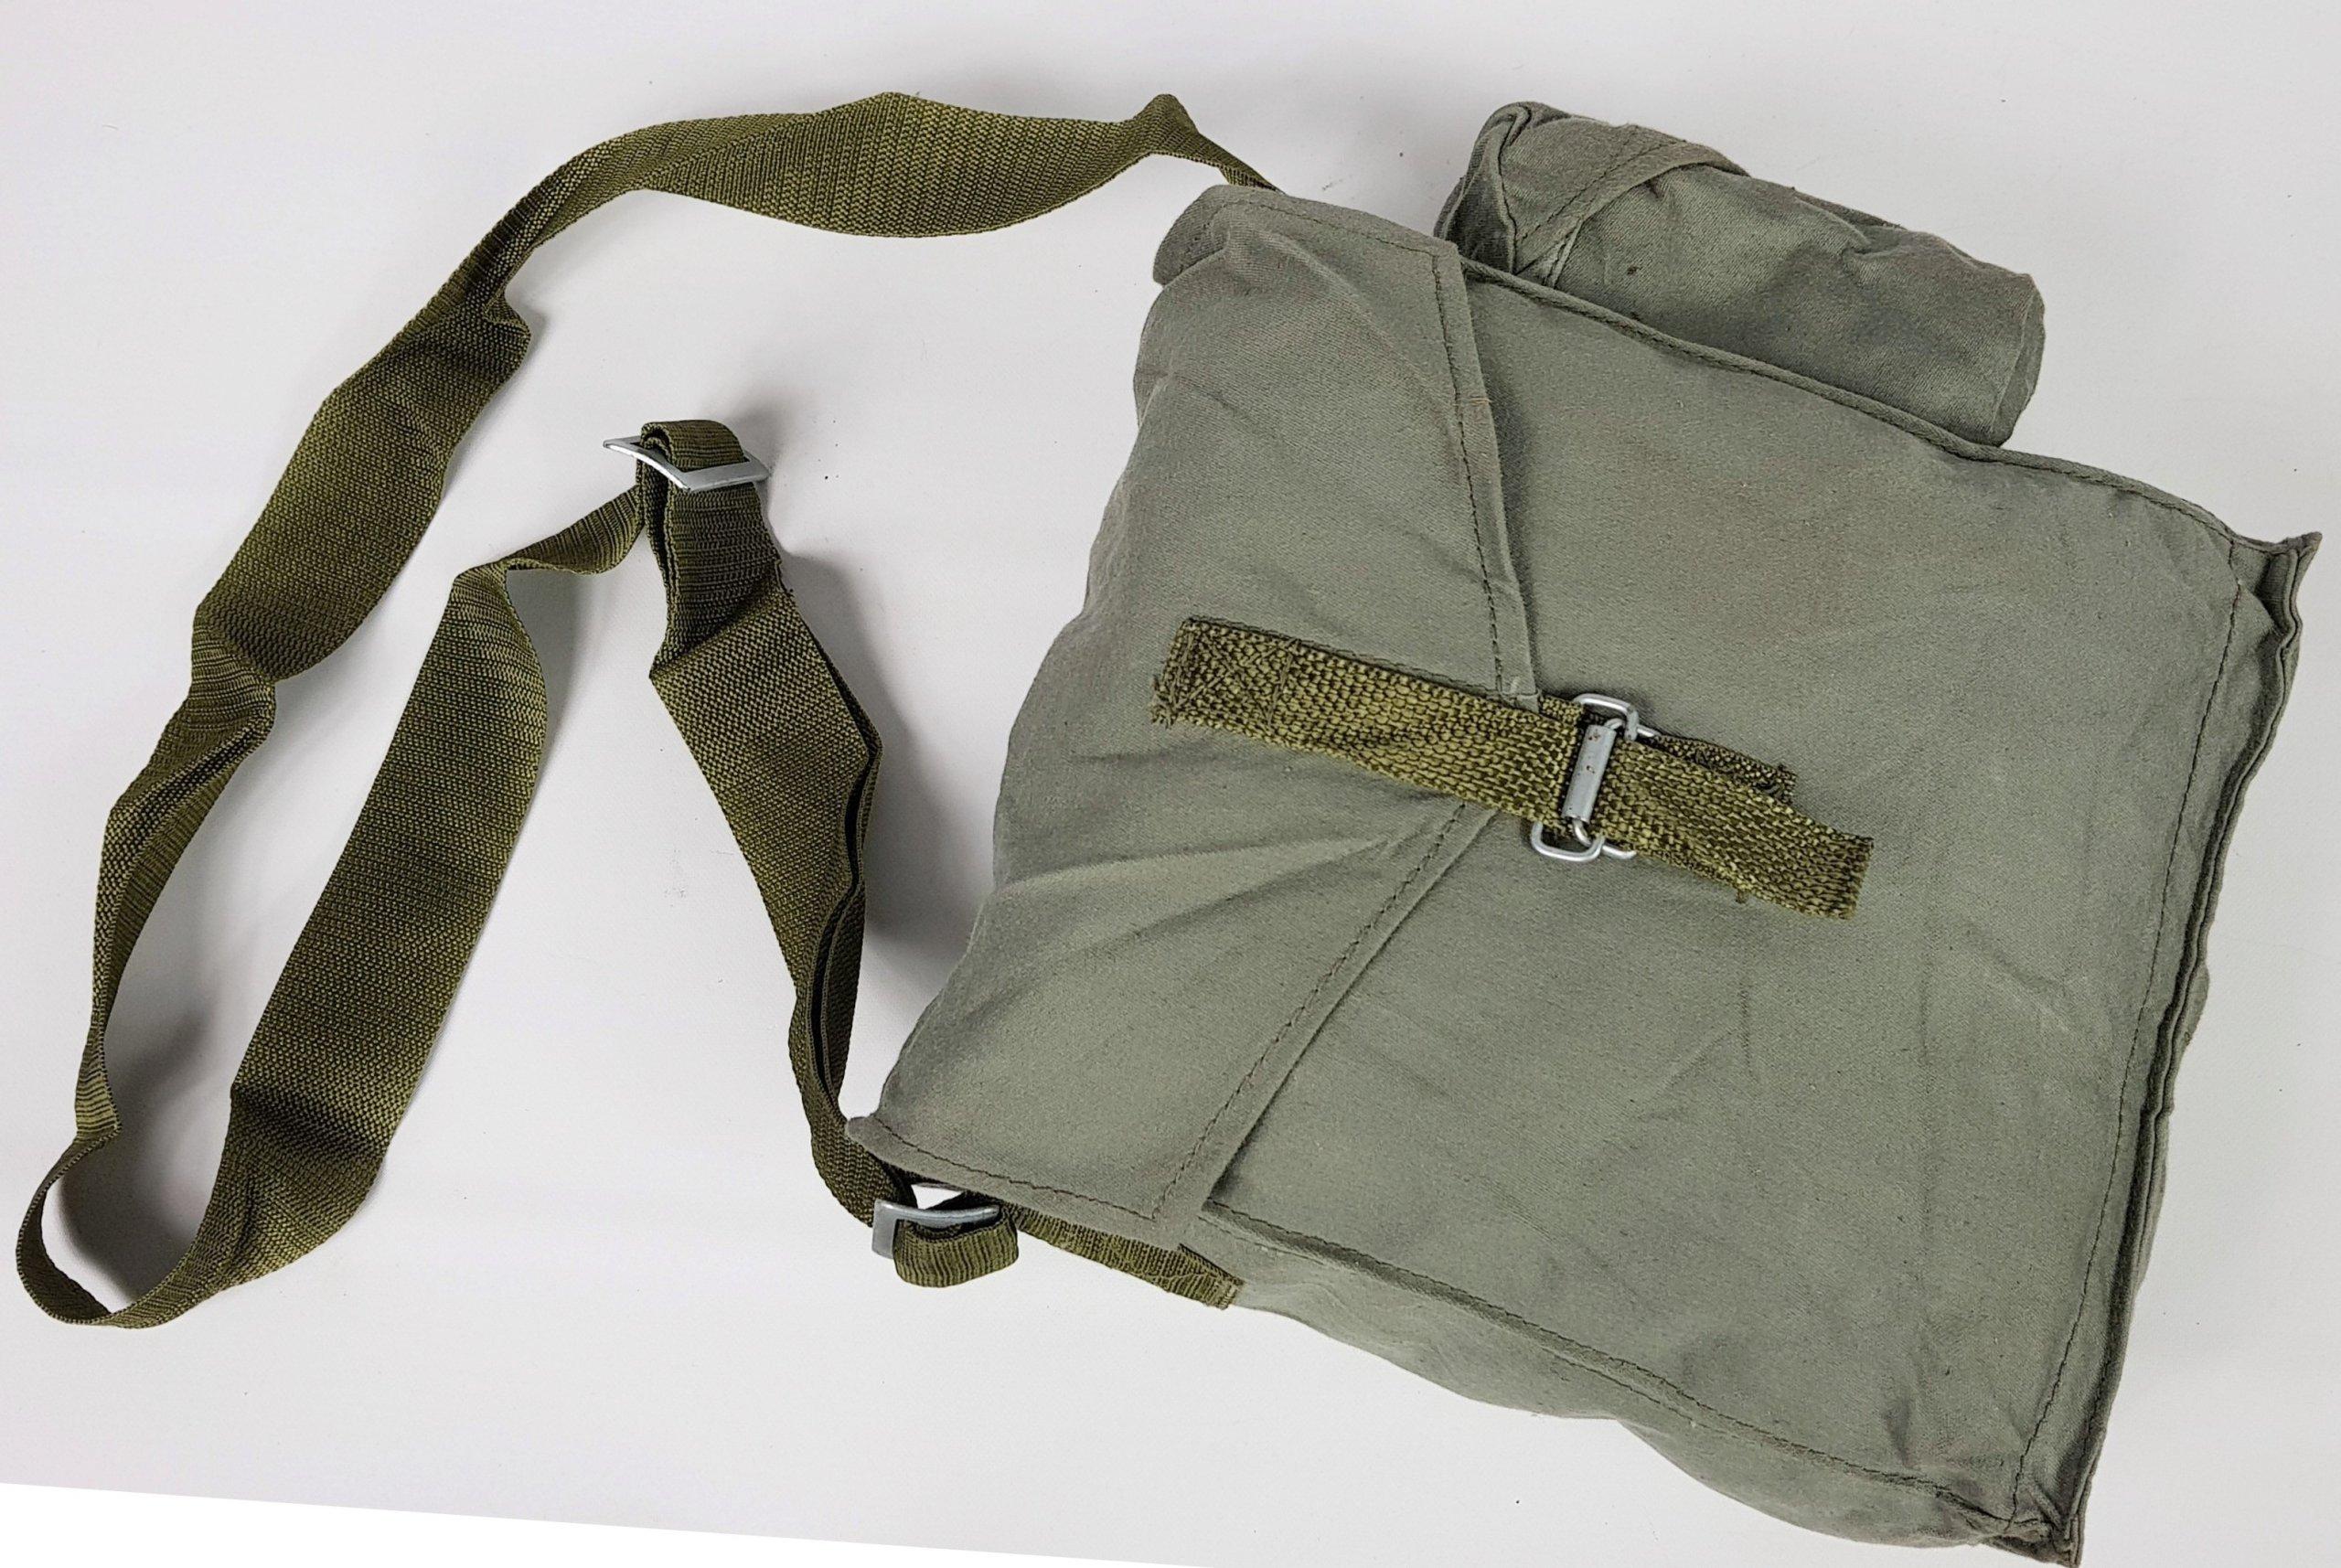 Vojenská taška z MUA / SZM41M s NT ramenným popruhom